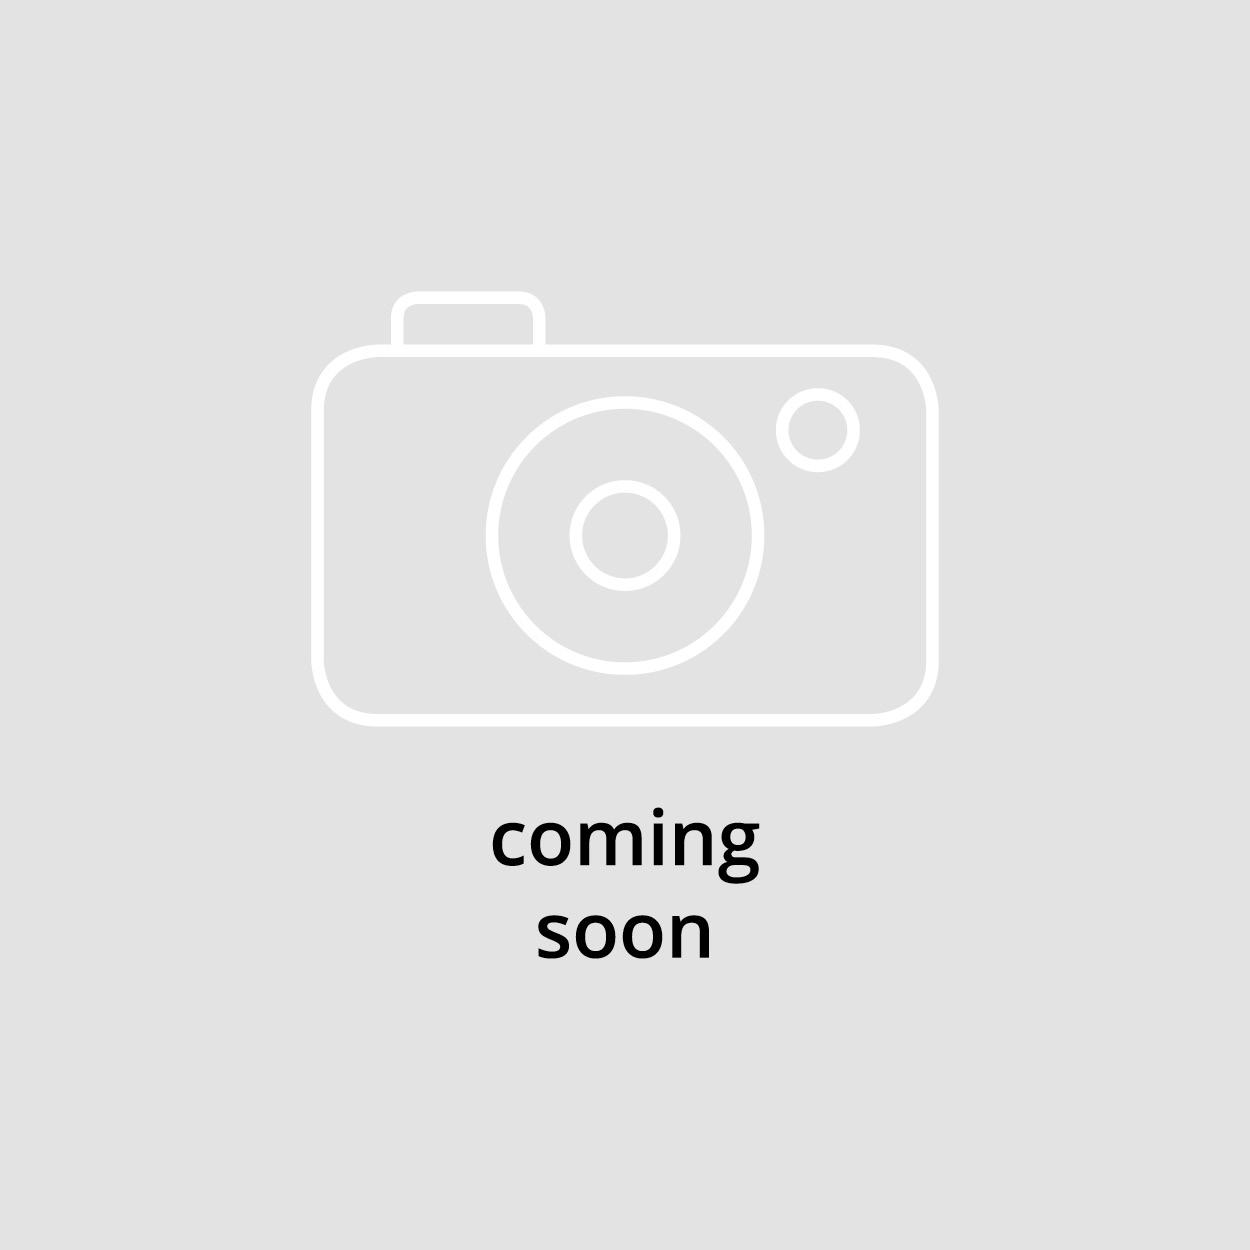 08.34.500 Portautensile prismatico piatto per Gildermeister  AS16, AS20, GM20, GM20AC, GS20